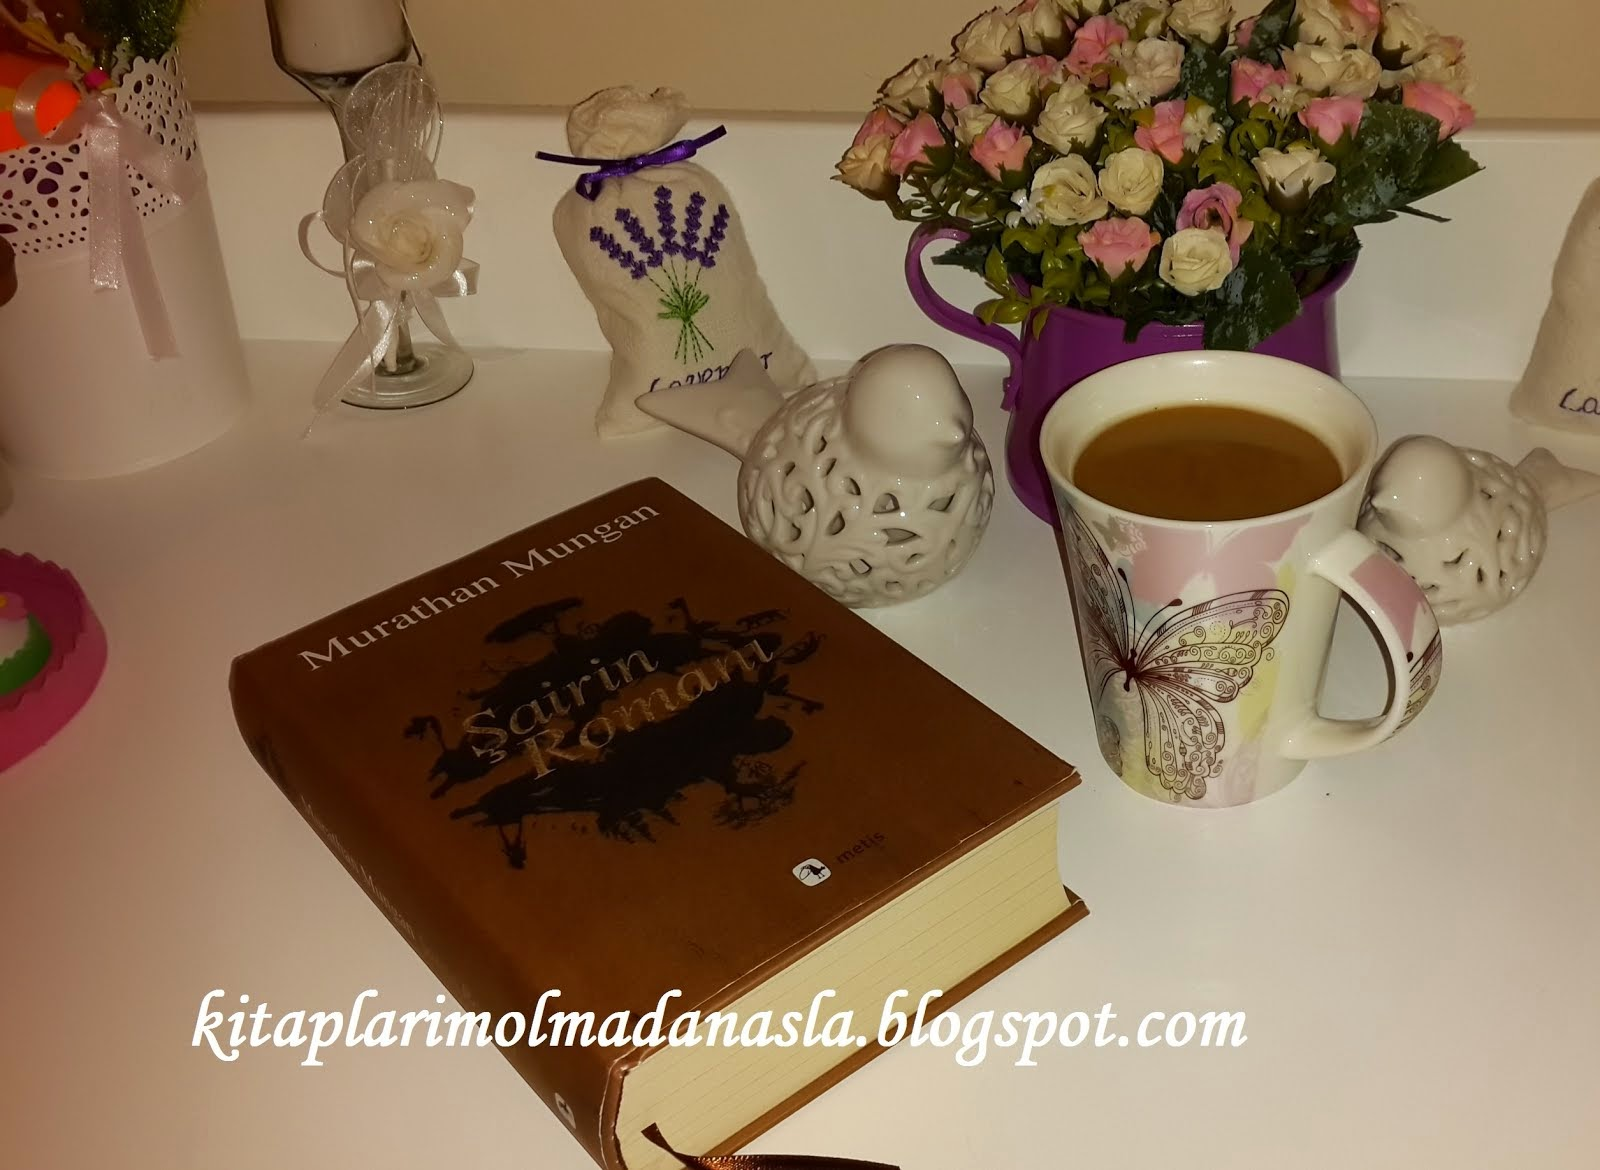 MURATHAN MUNGAN - ŞAİRİN ROMANI - 1